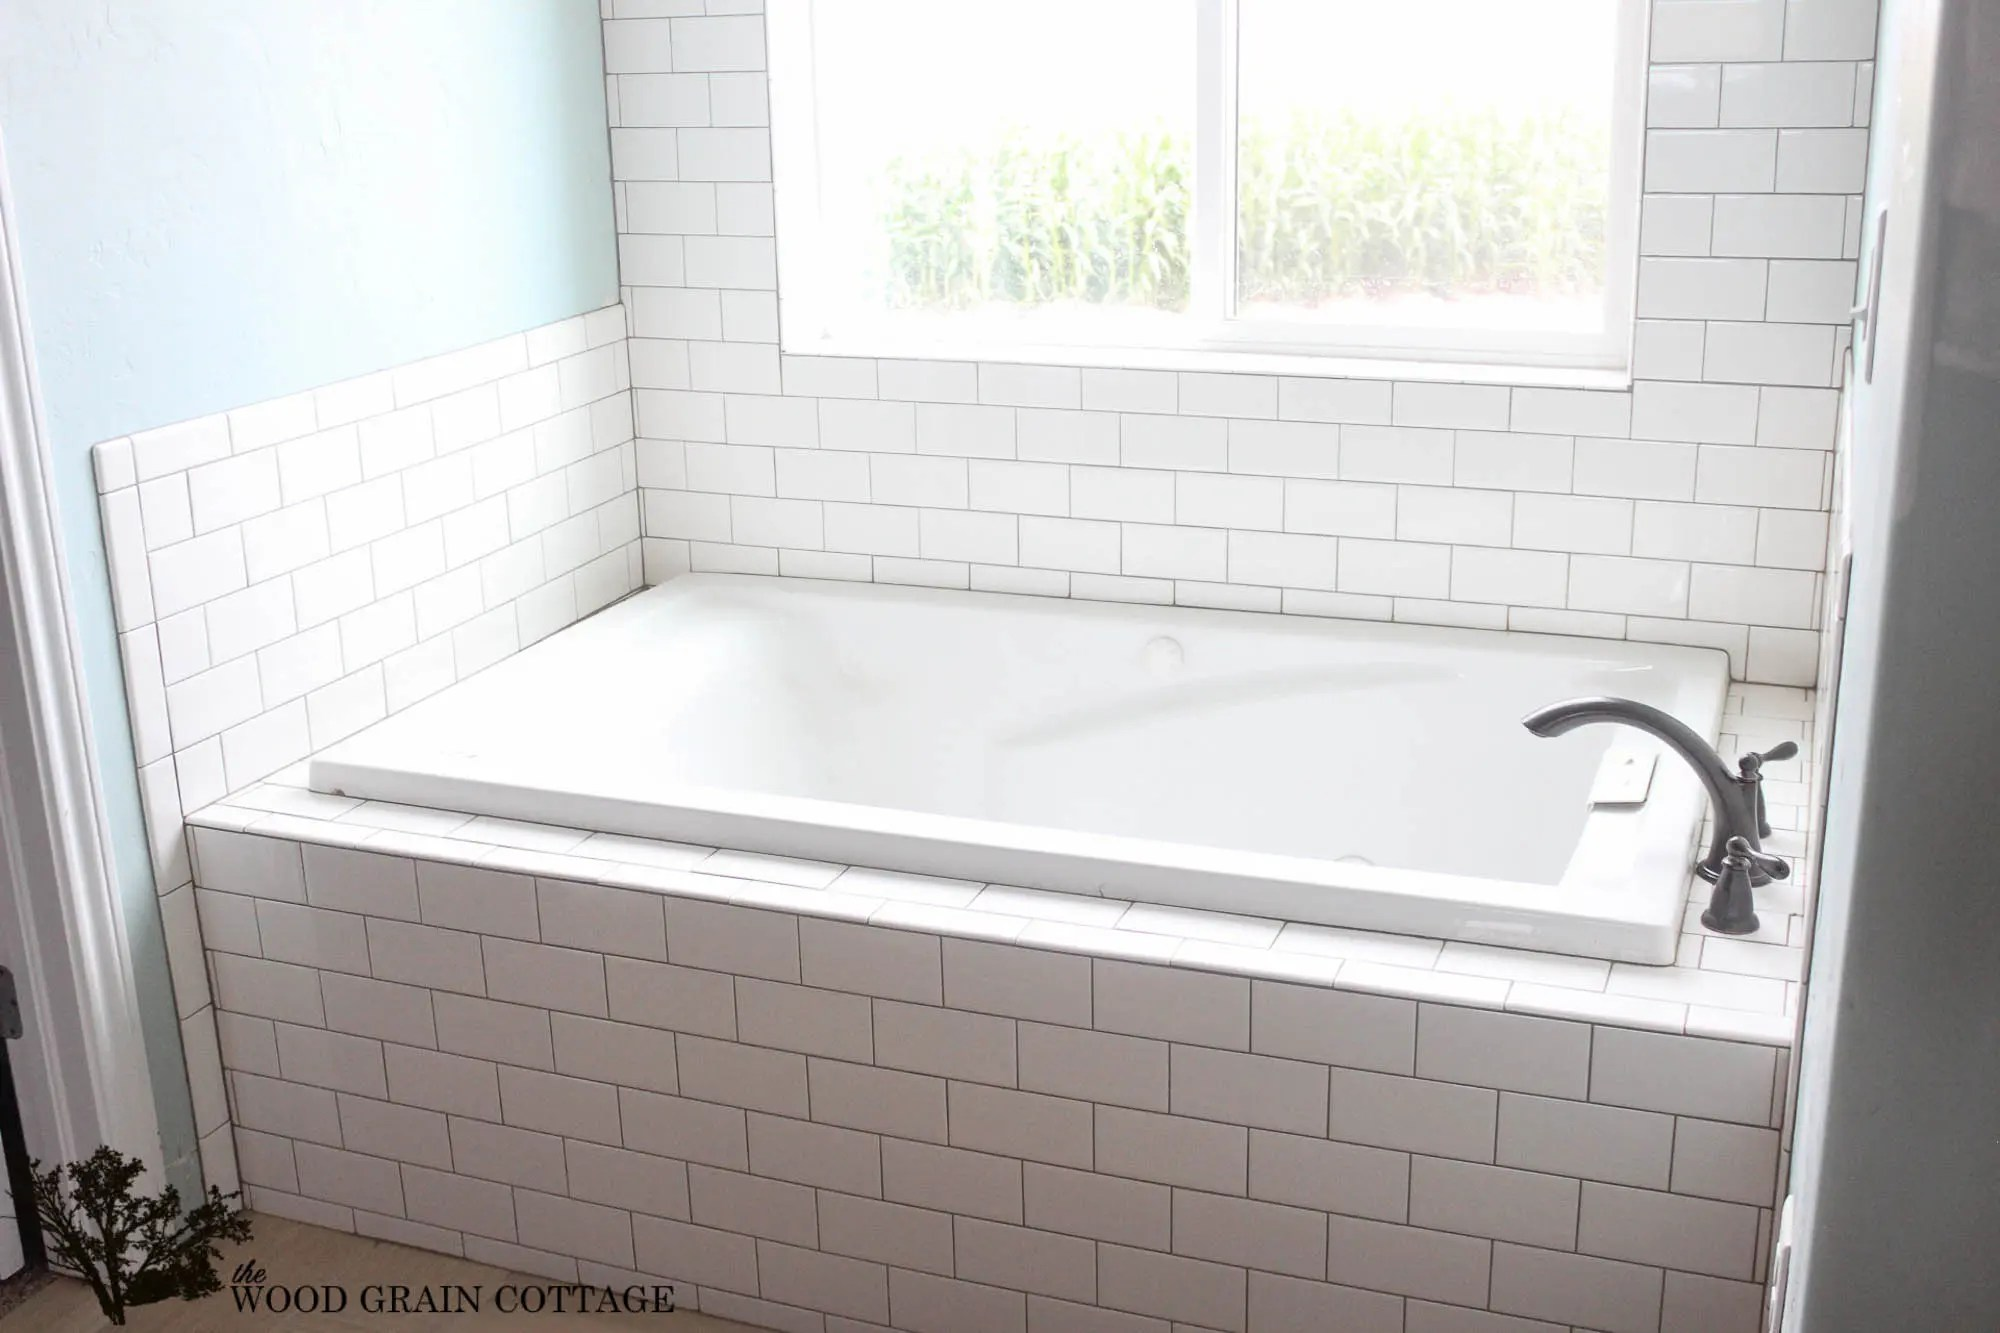 wood grain porcelain tile bathroom with dark floor